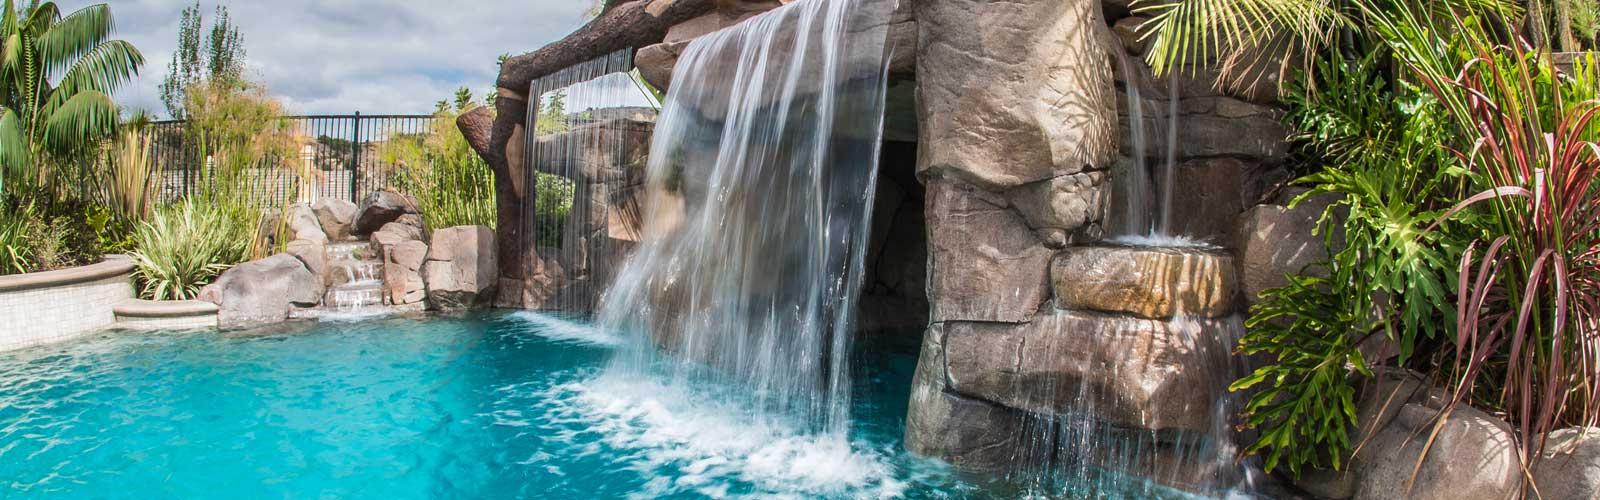 drc-pools-waterfall